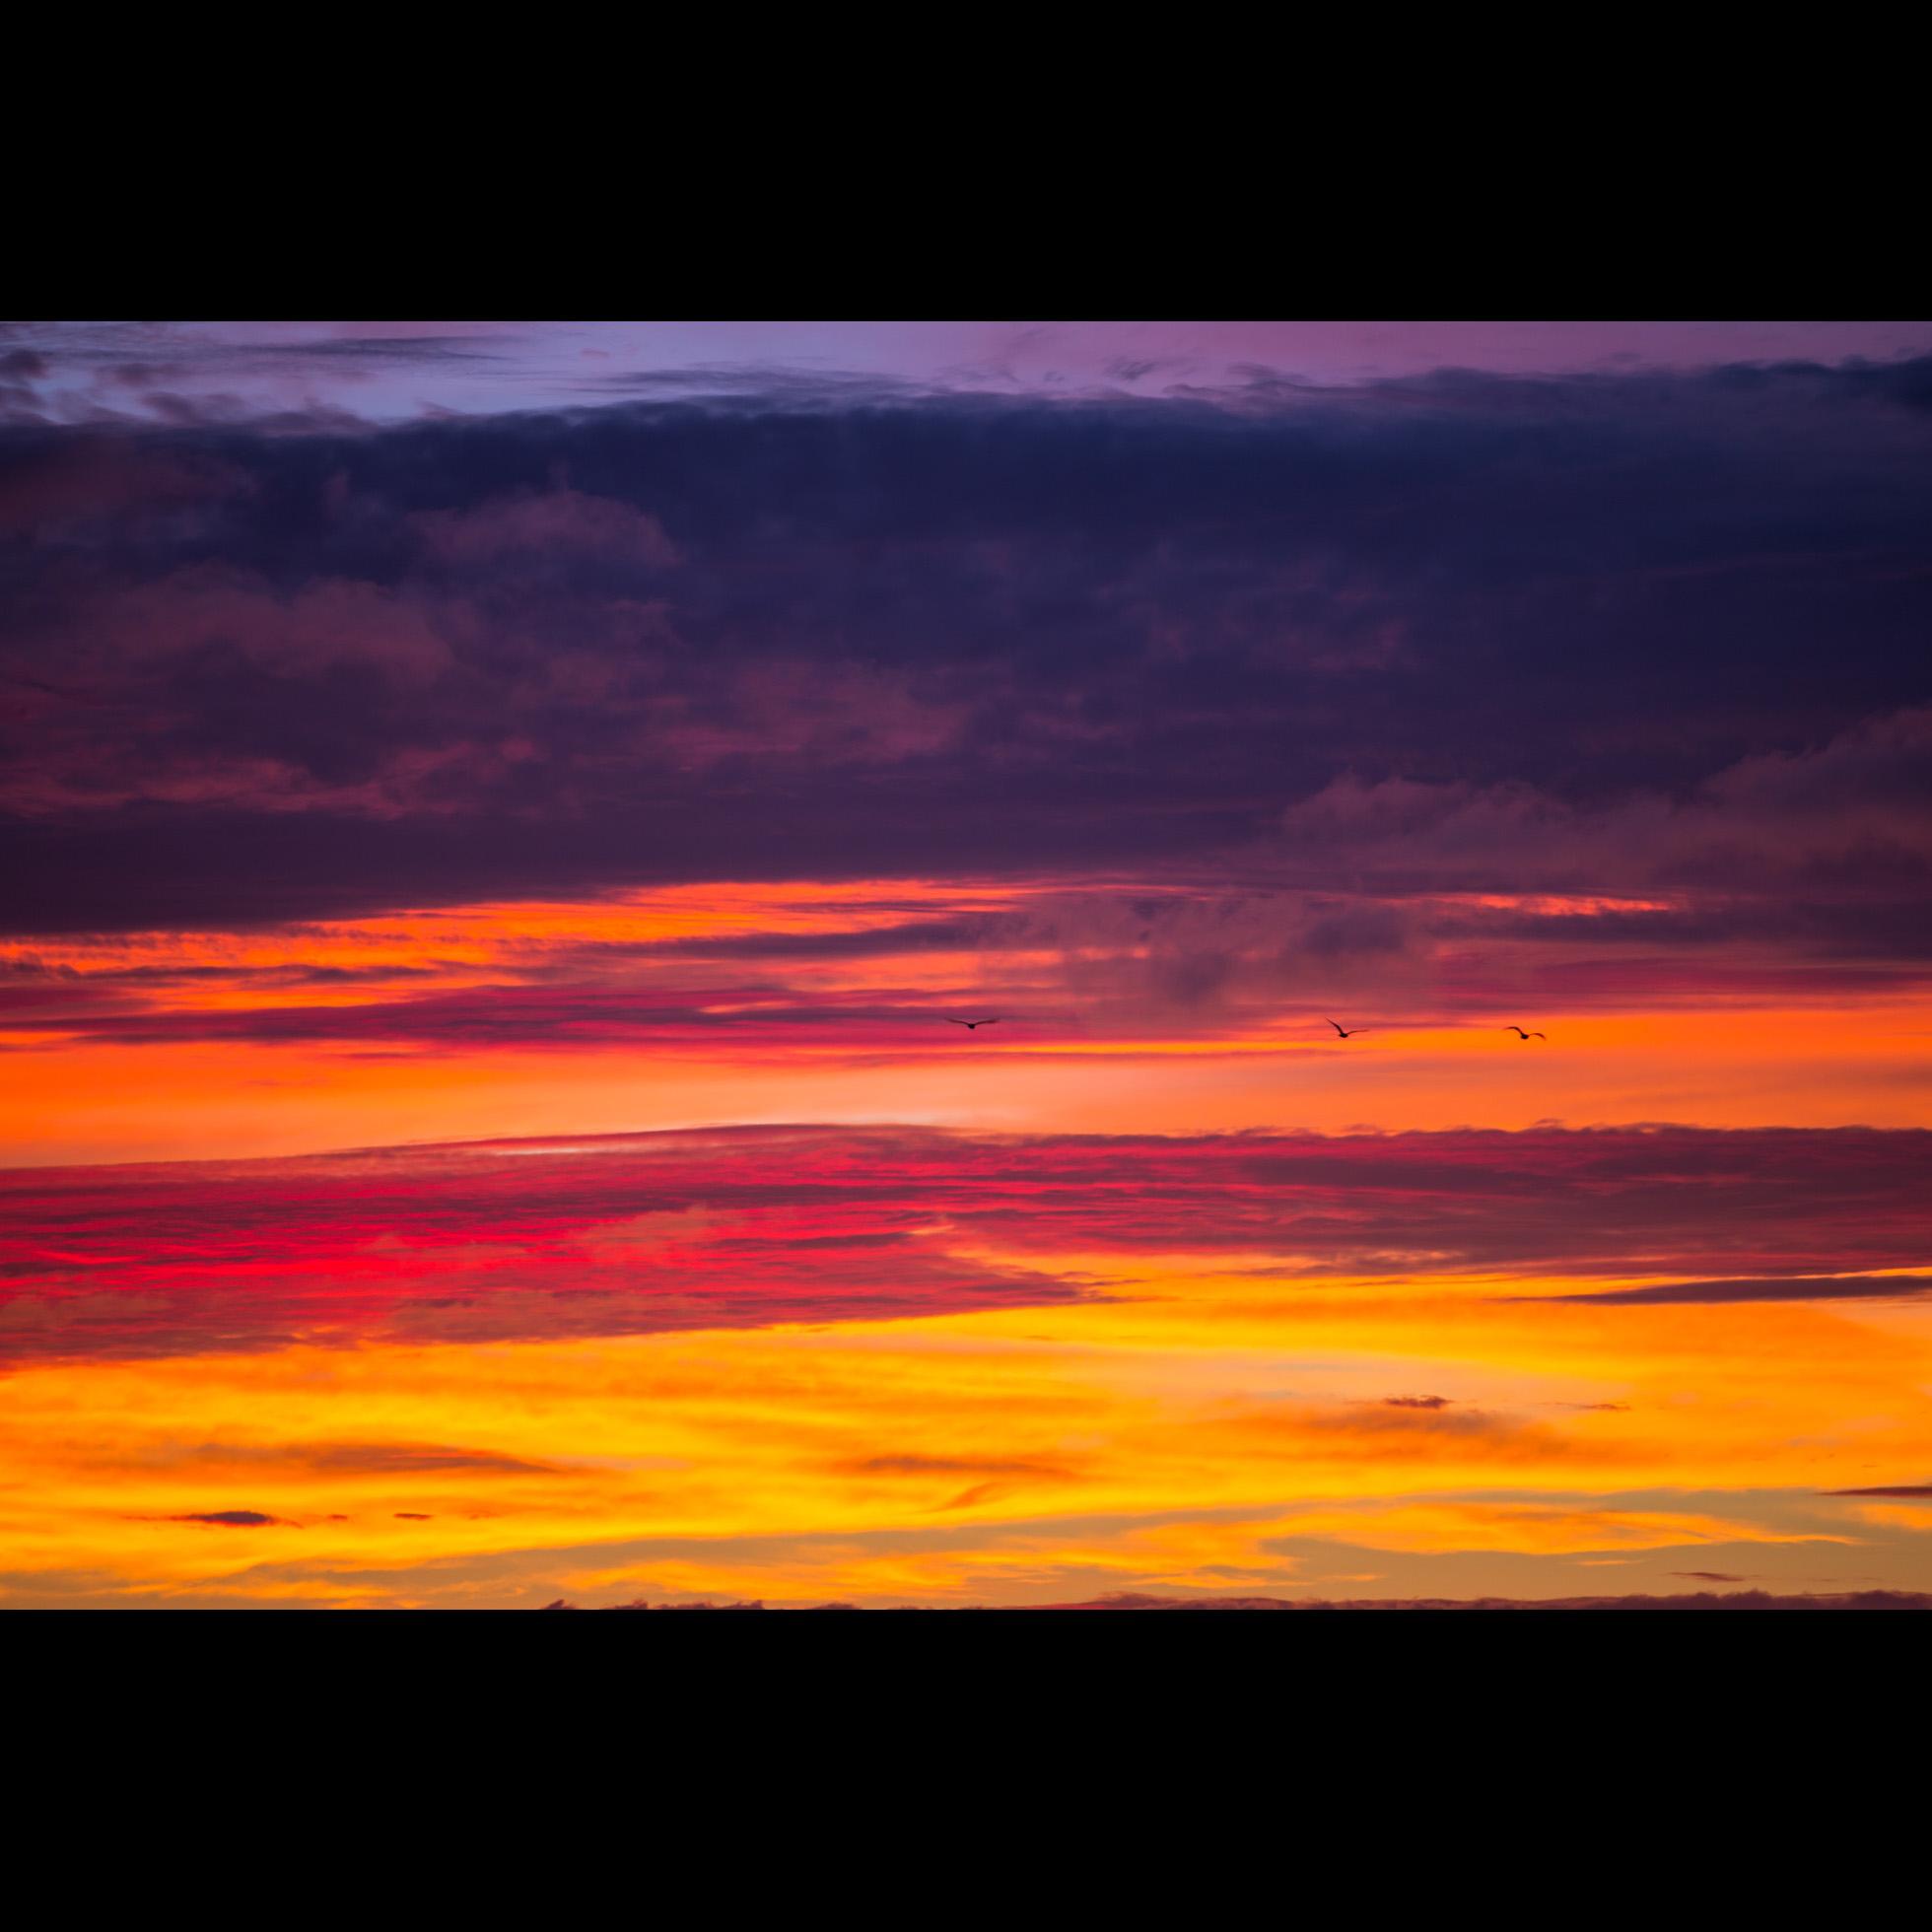 9.22 SOUTH BEACH SUNSET